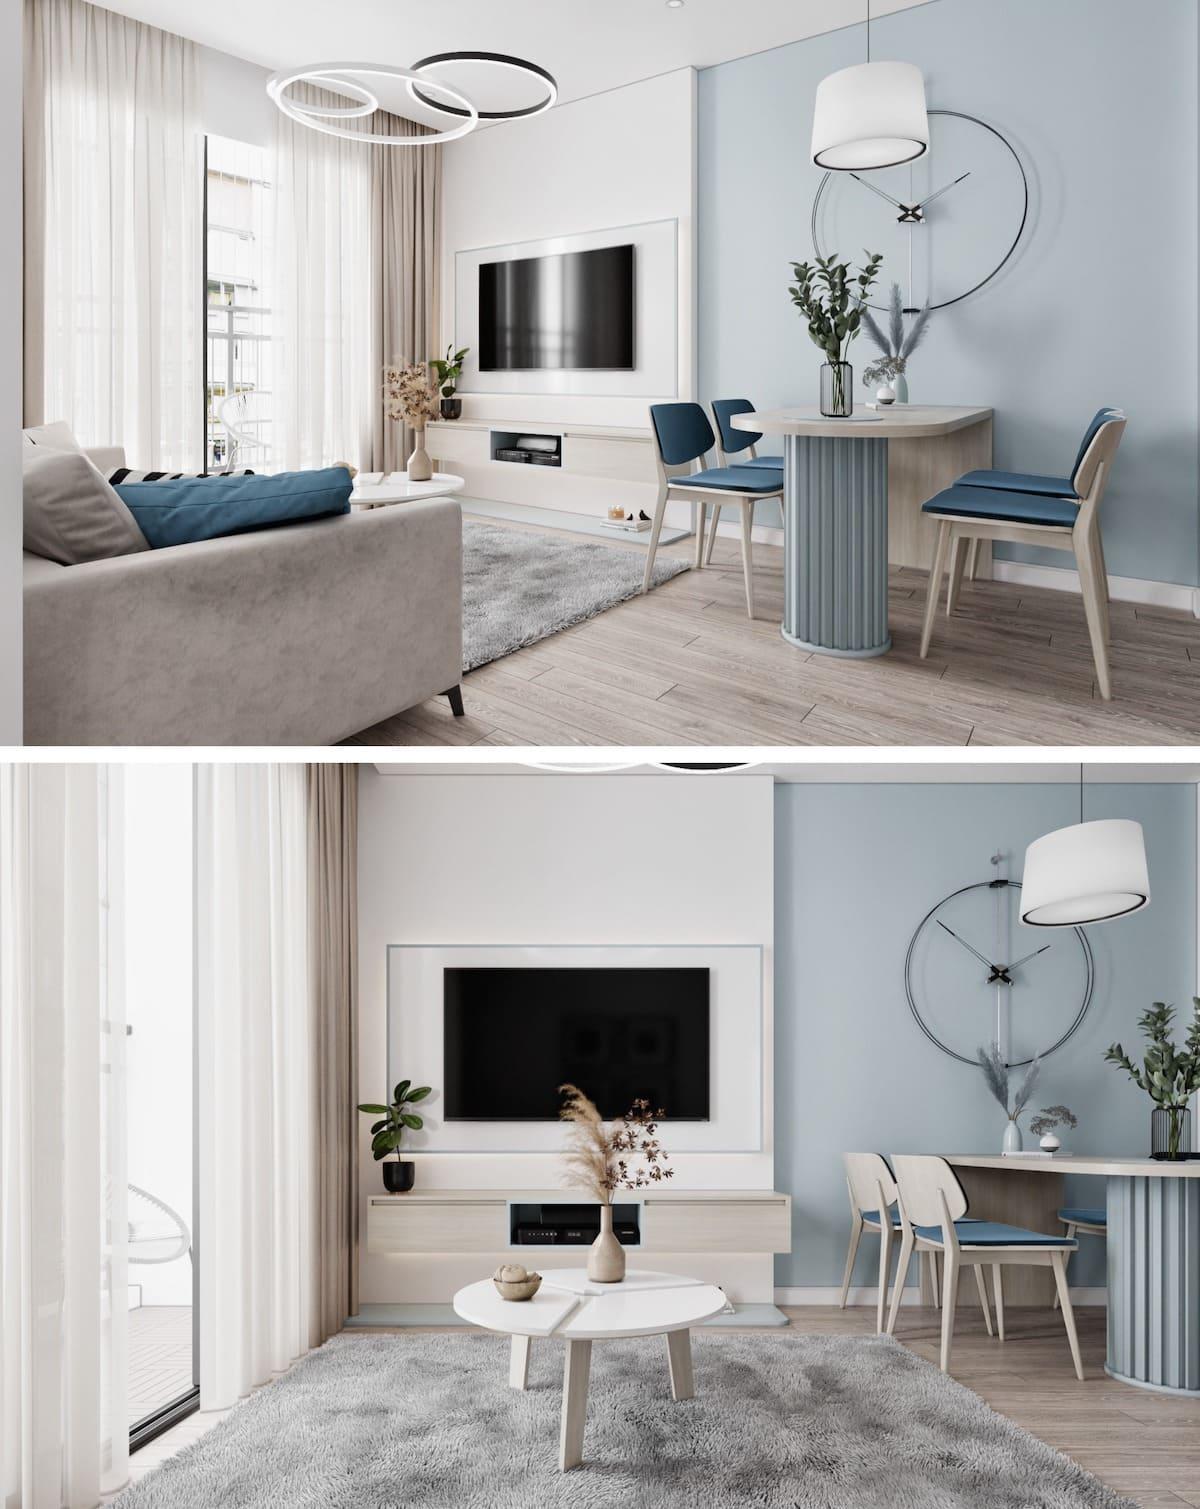 дизайн интерьера модной квартиры фото 80